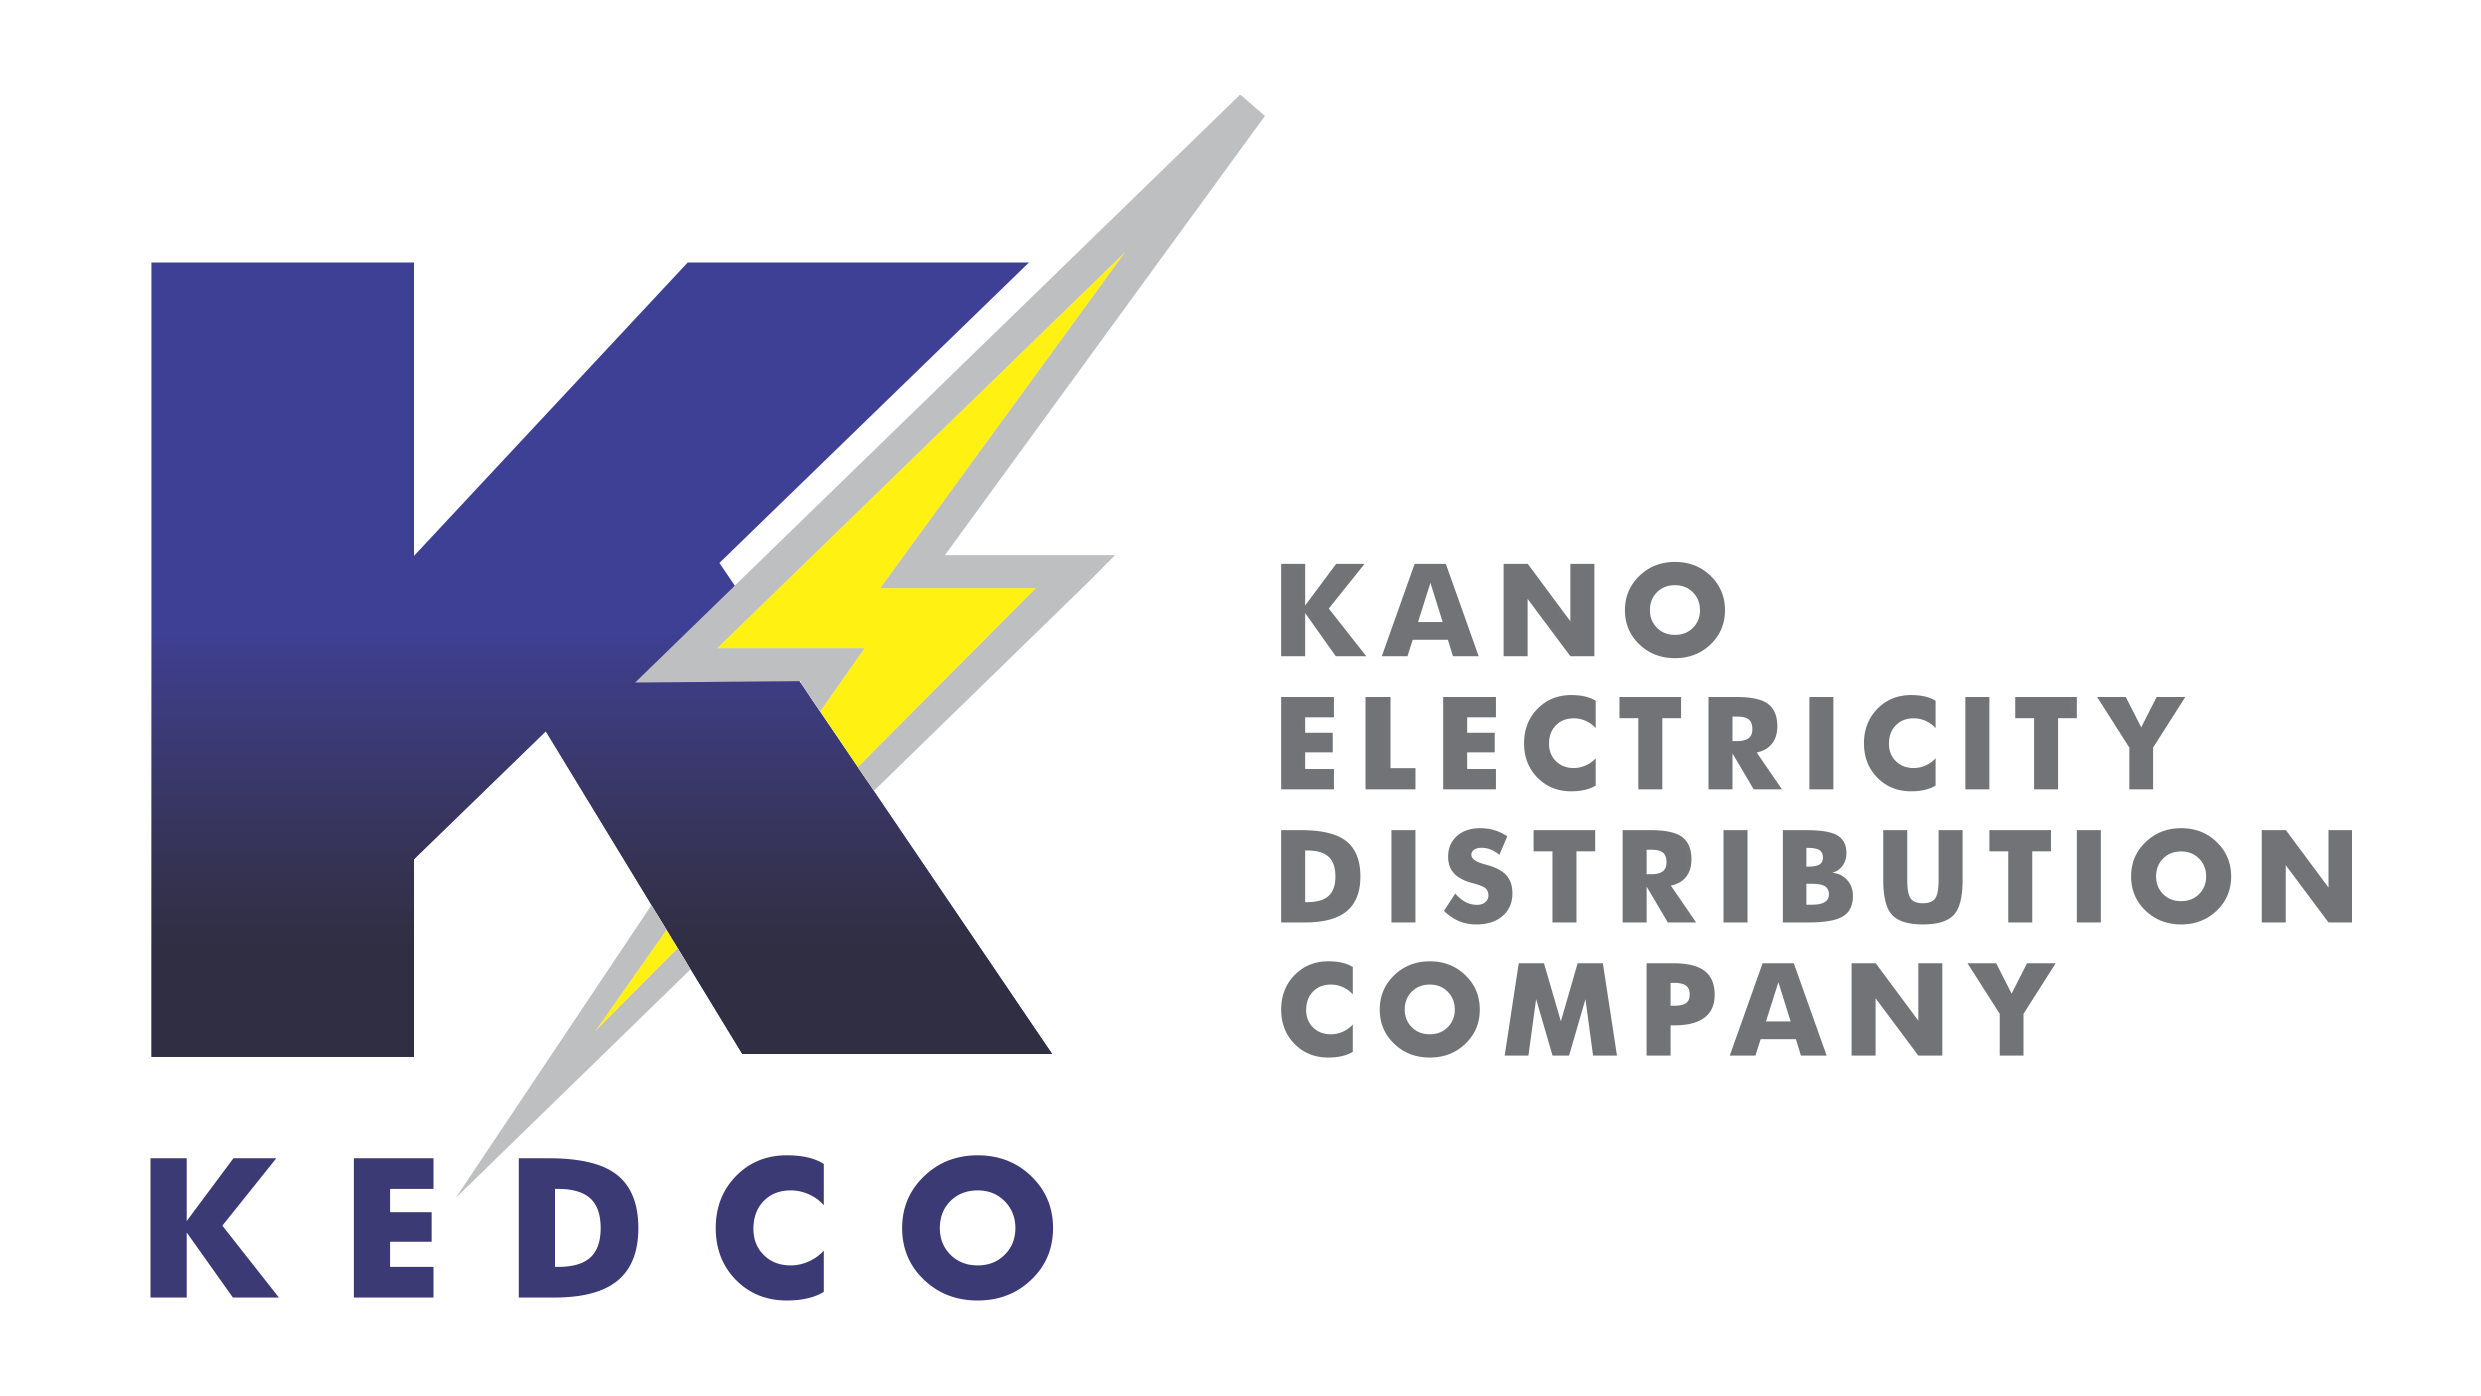 KEDCO | Kano Electricity Distribution Company Plc